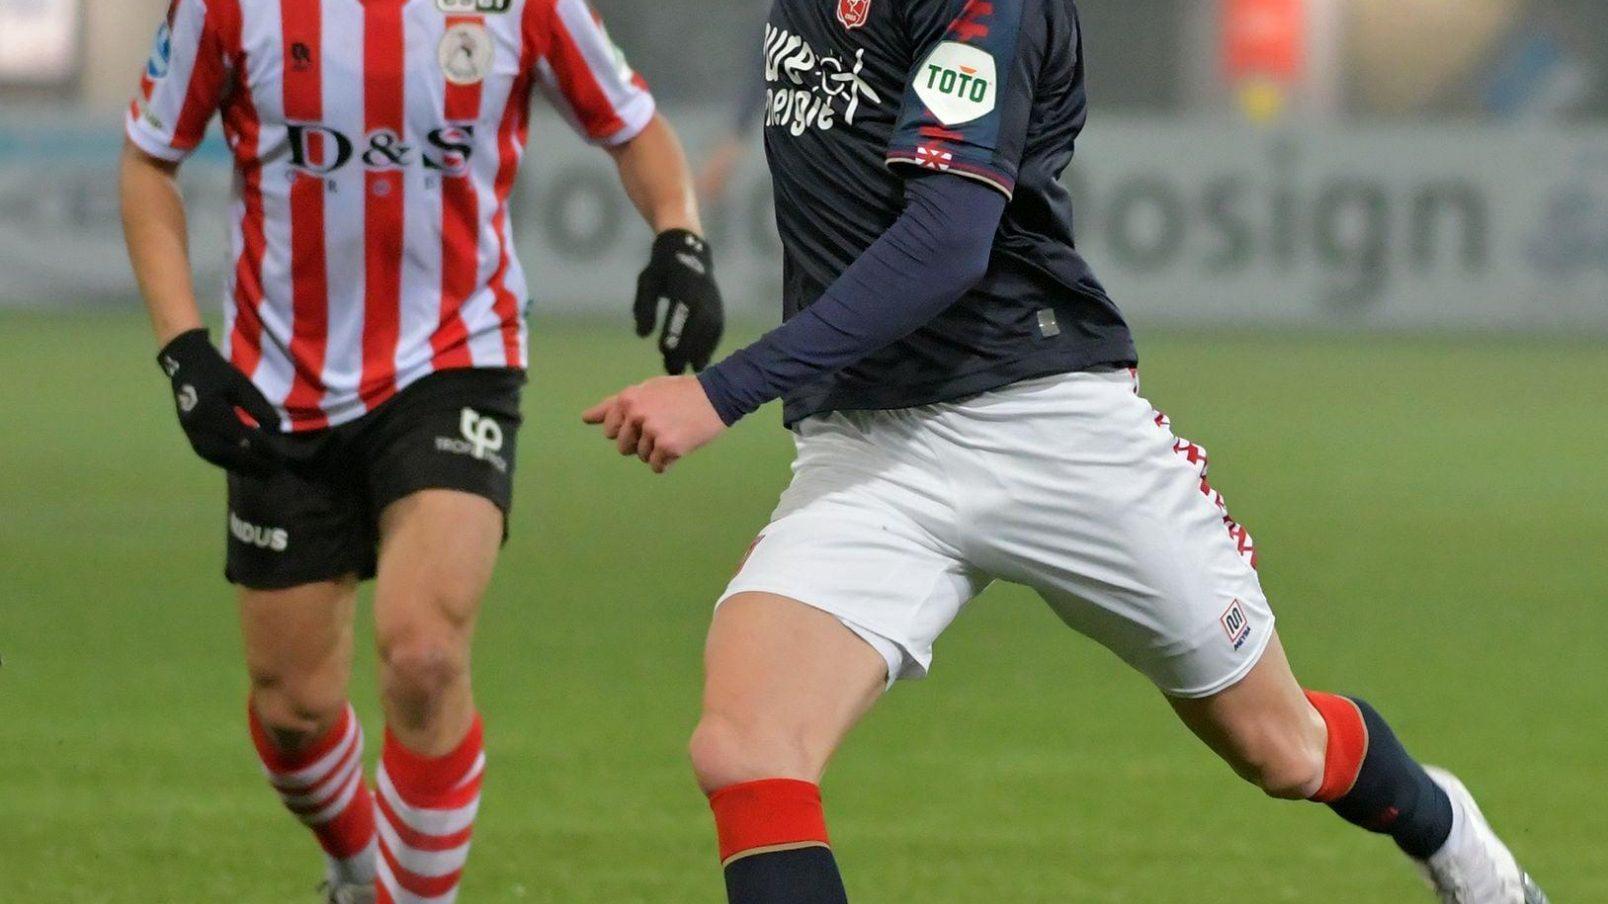 Sparta Rotterdam - FC Twente